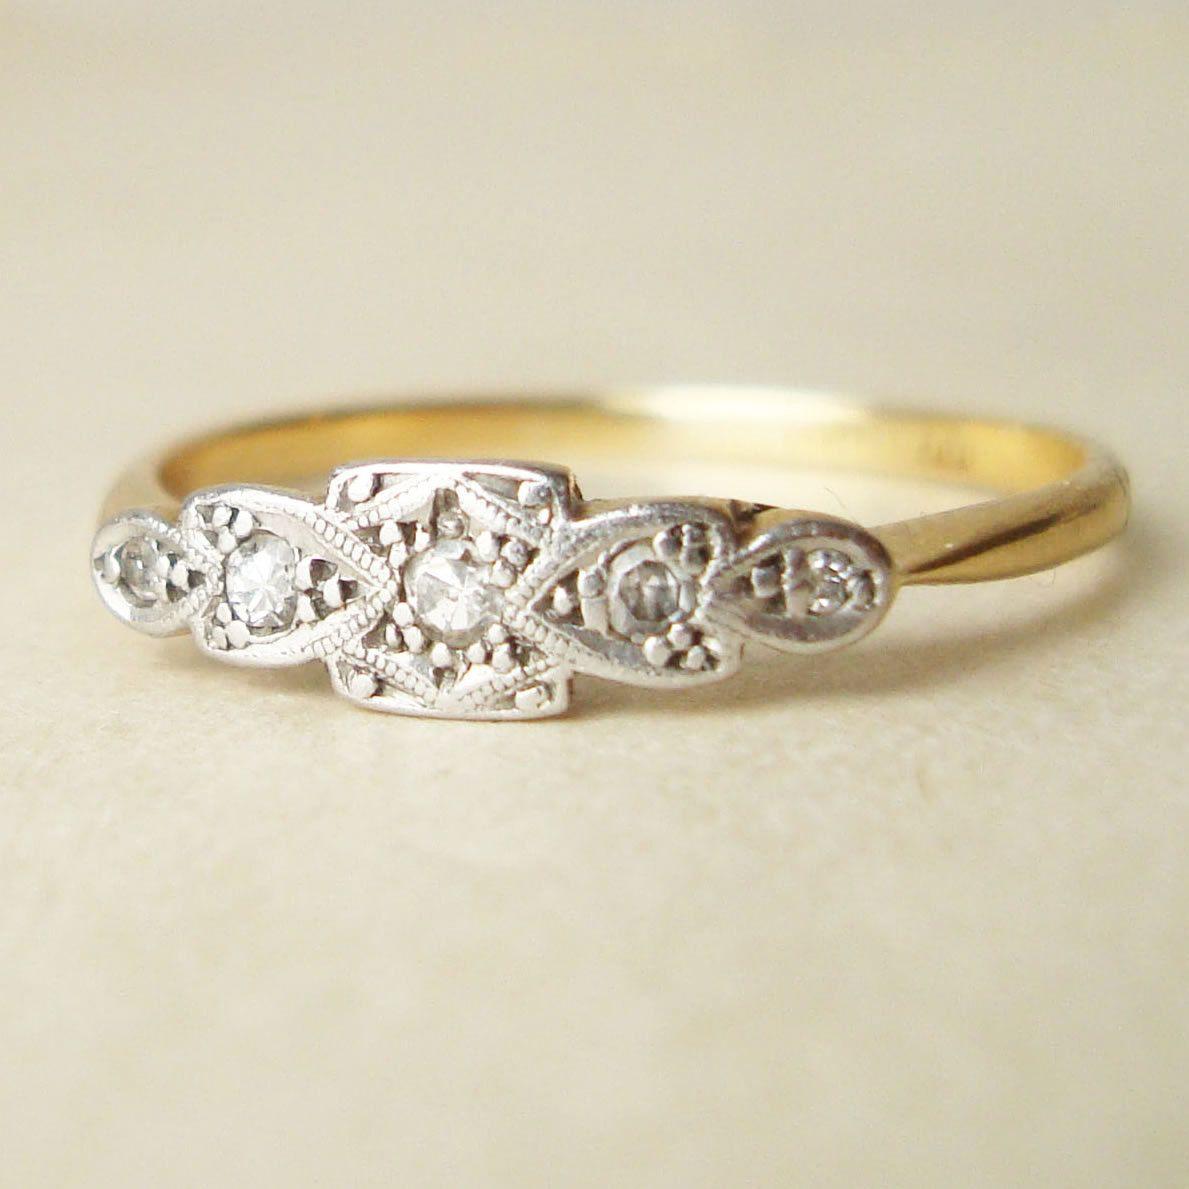 Art Deco 18k Gold Diamond Ring, Antique Diamond Platinum & 18k Gold Engagement Wedding Ring Approximate Size US 8.25